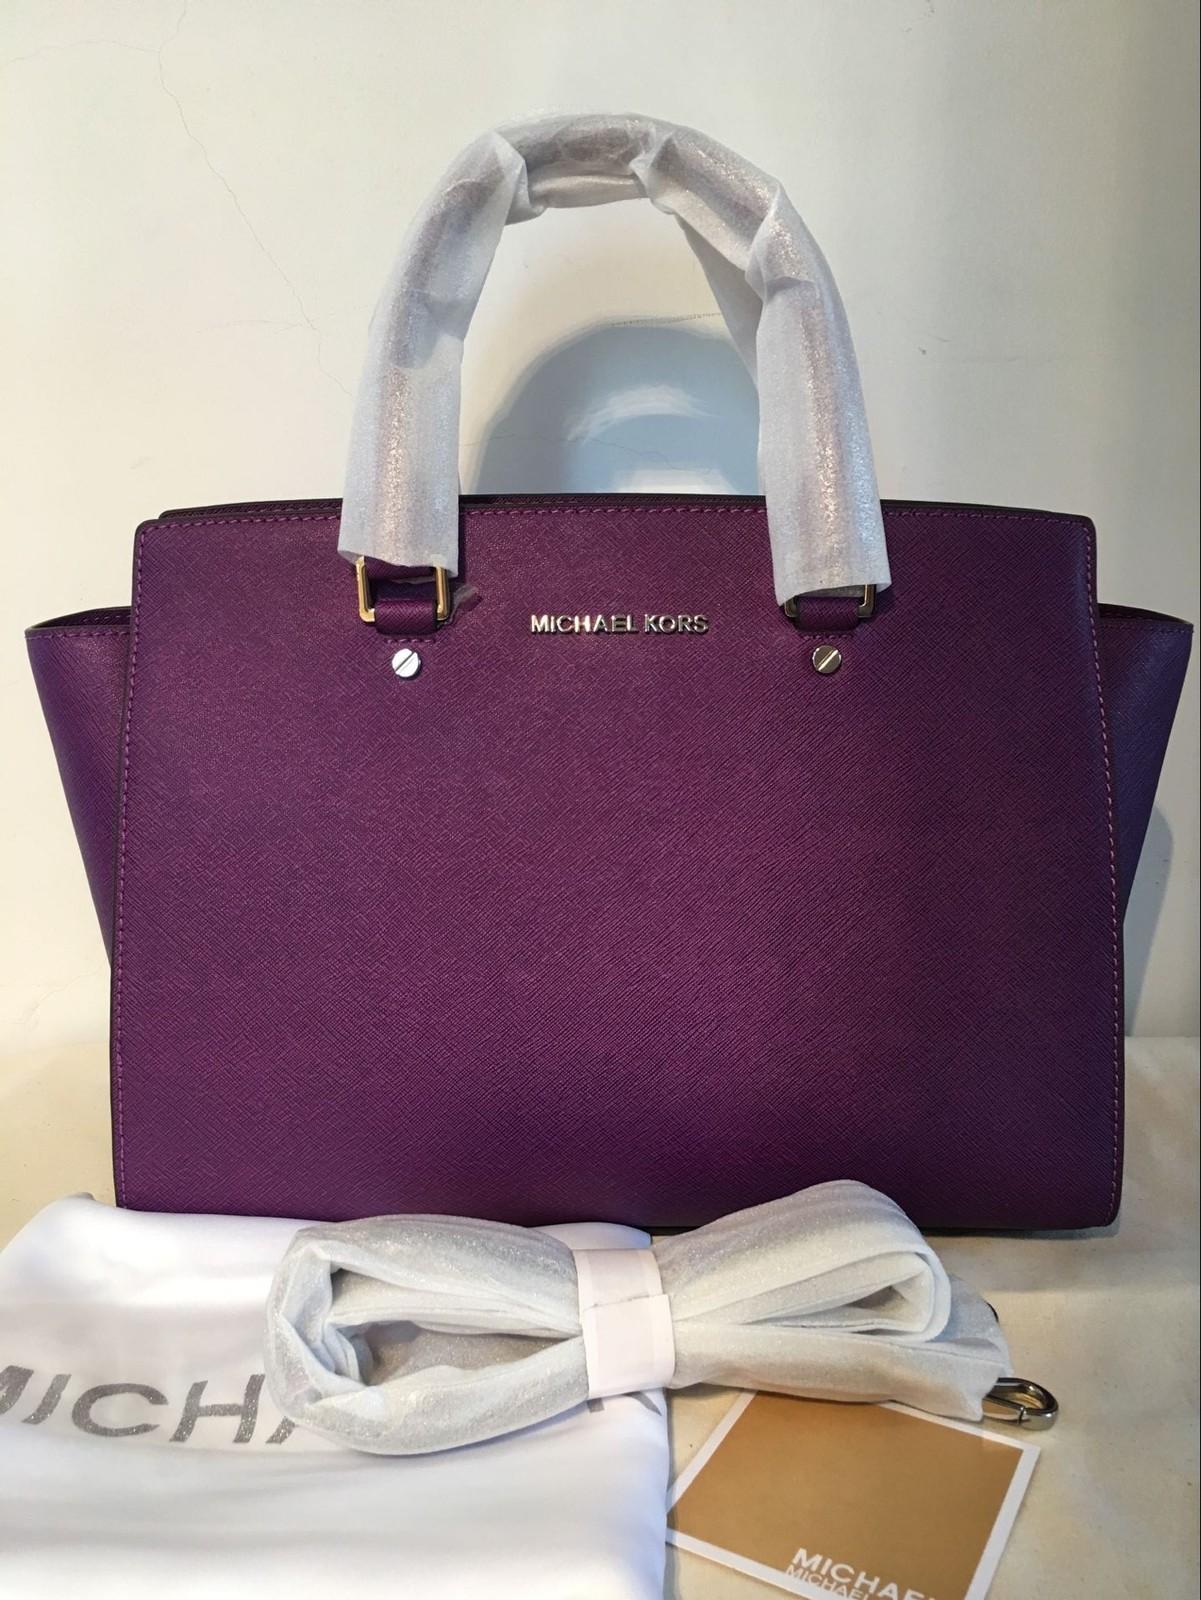 dada4a60c2f4d9 Qq 20170520101306. Qq 20170520101306. Previous. Michael Kors Women's Selma  Large Top Zip Satchel Satchel Handbag Purple